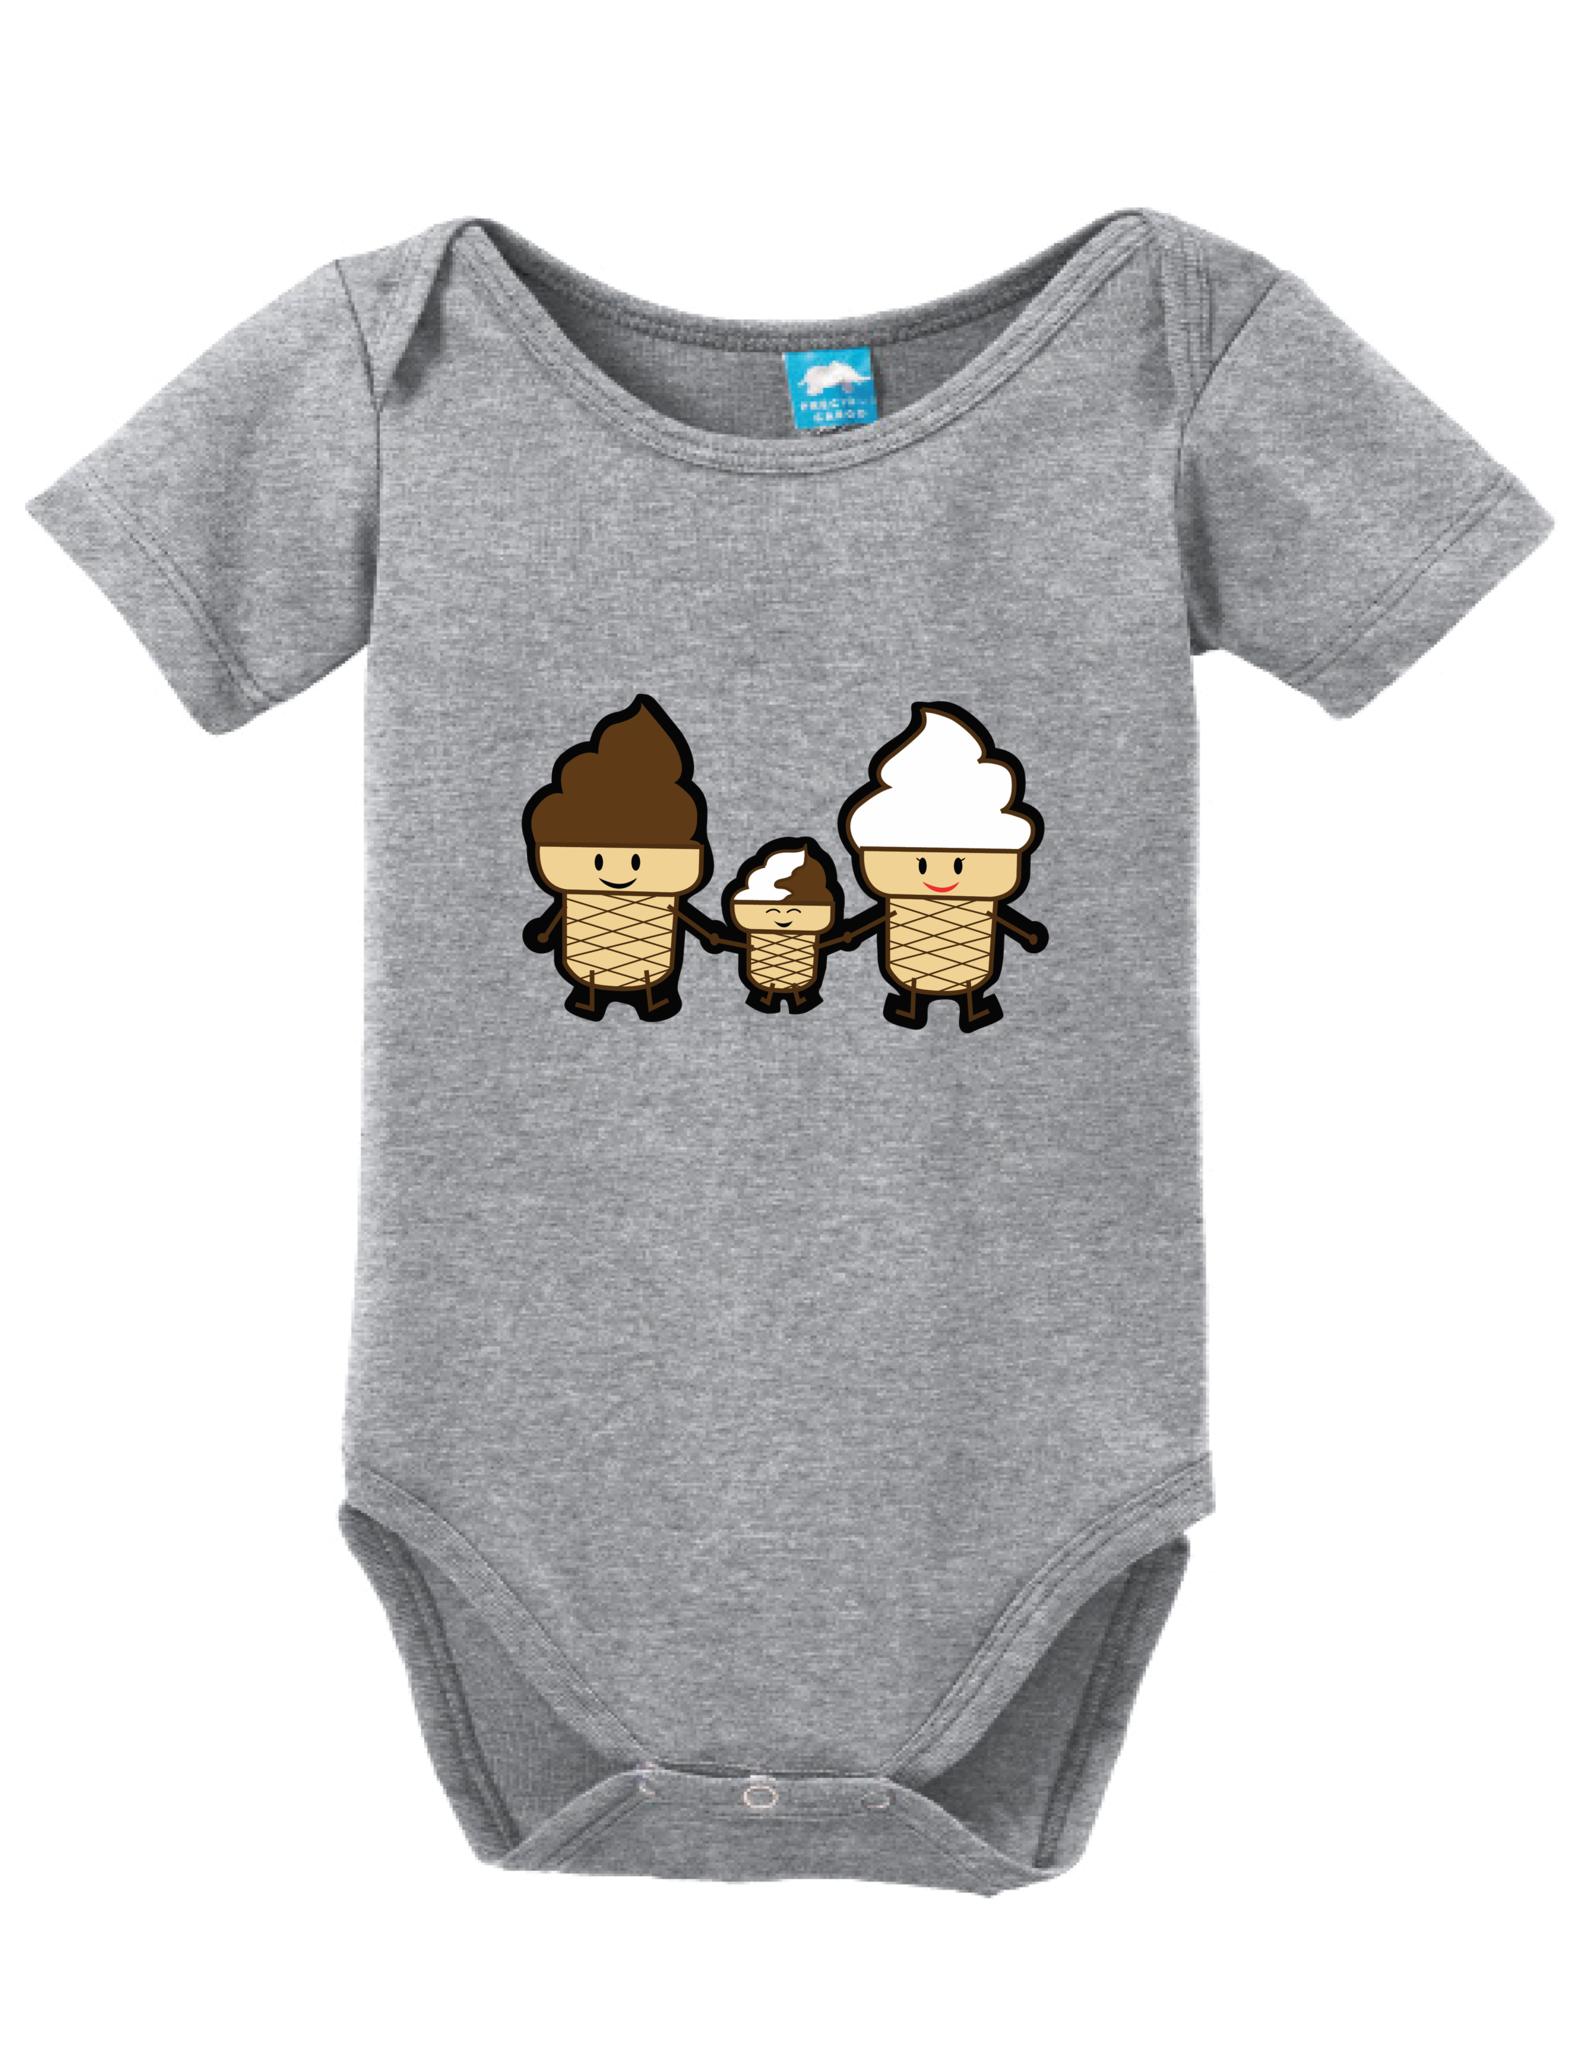 Mixed Chocolate Vanilla Chocolate Vanilla   Bodysuit, Babies and ...